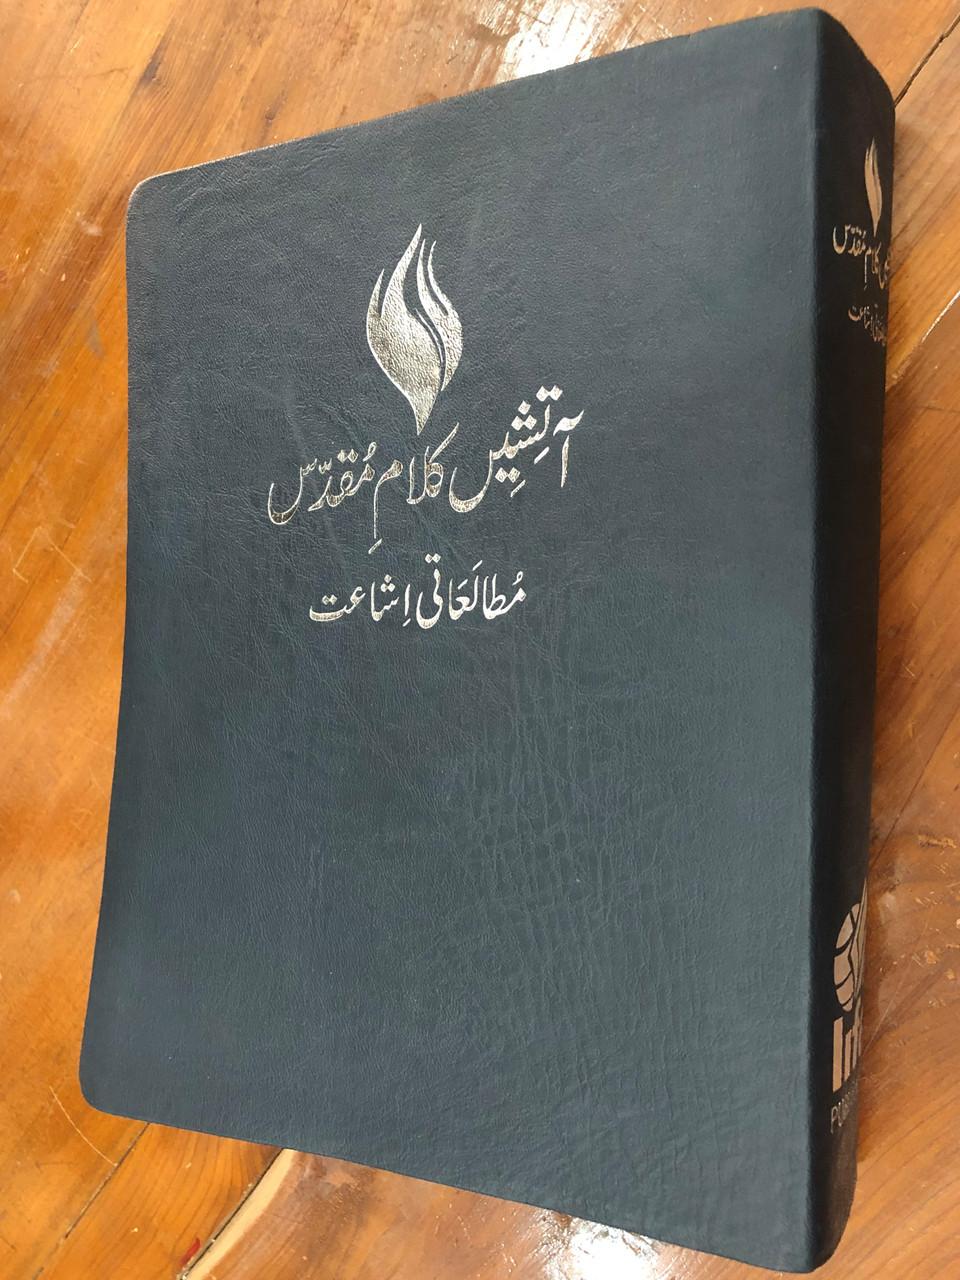 Urdu Spirit Filled Study Bible / Urdu Fire Bible / Pentecostal Bible / Life  Publishers 2016